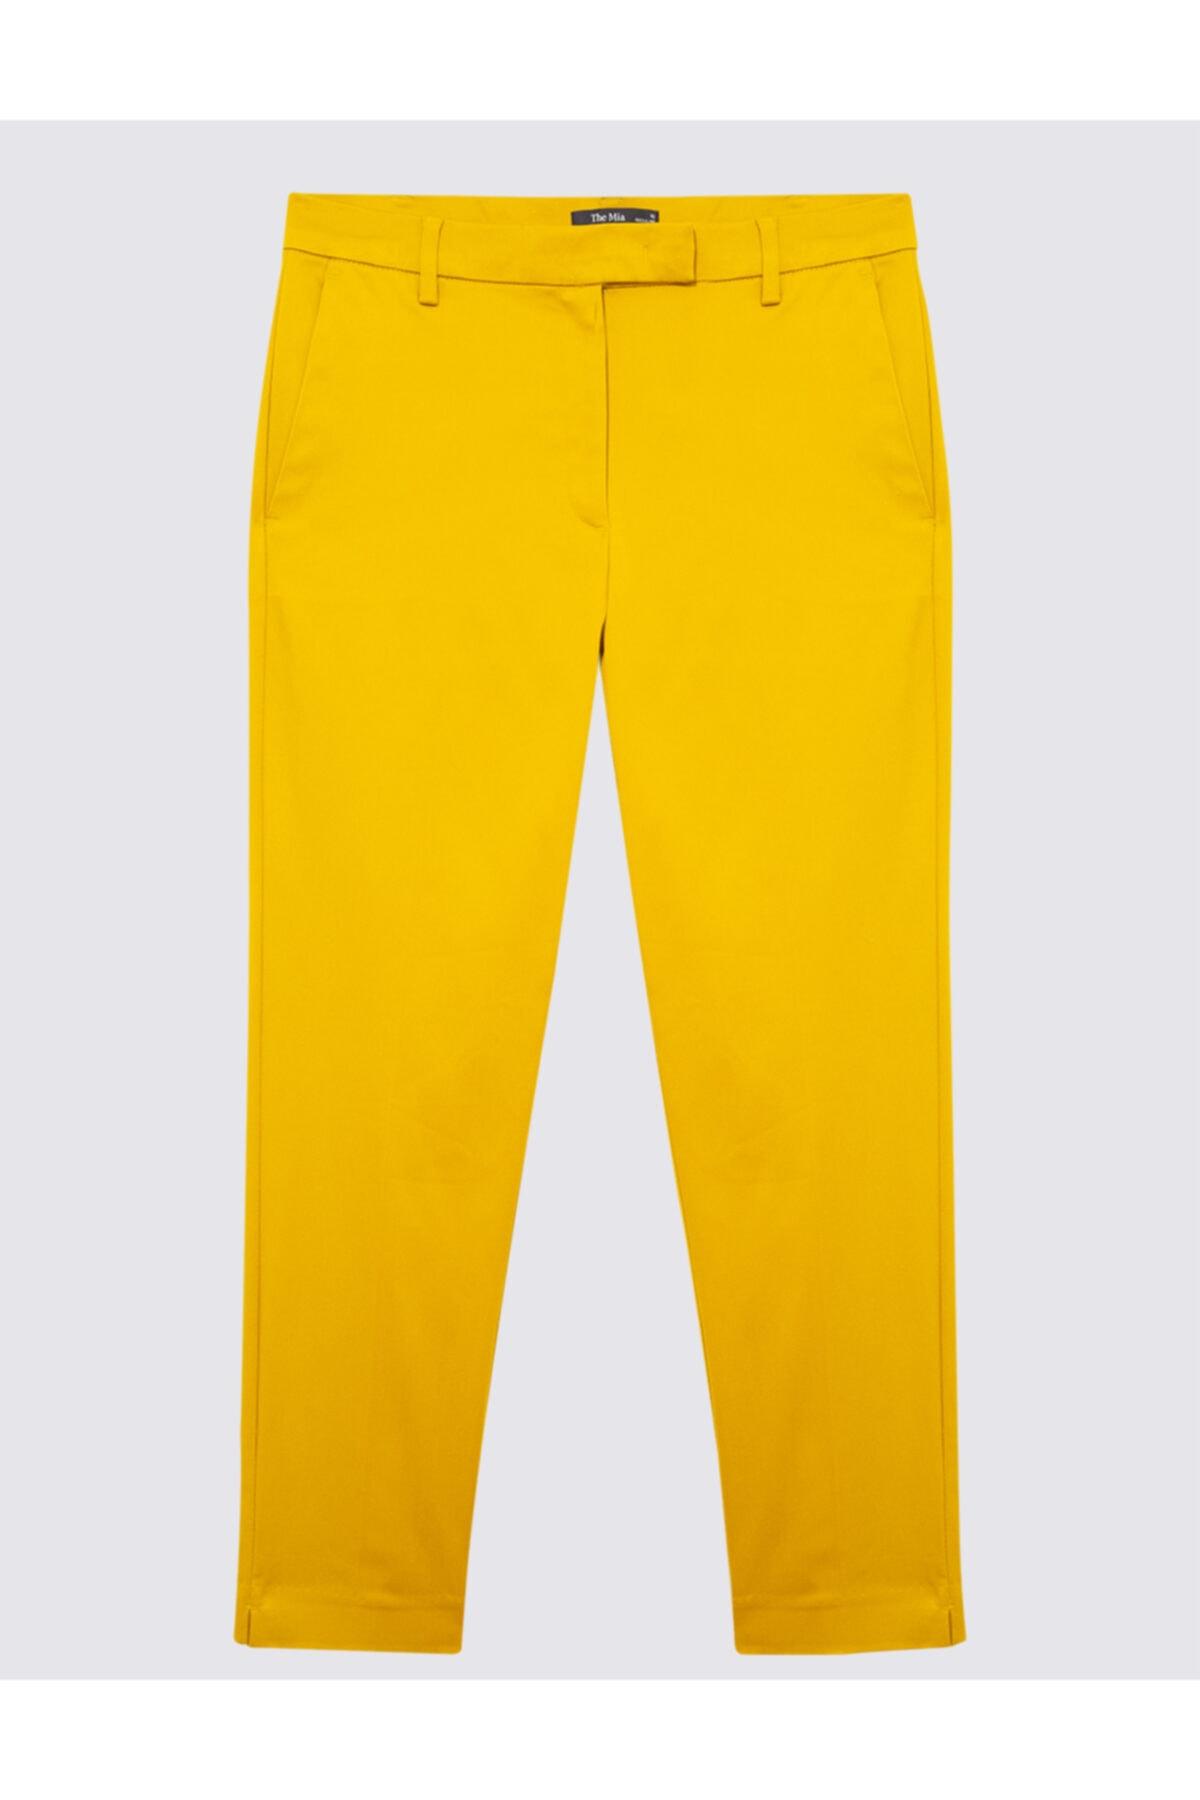 Marks & Spencer Pamuklu 7/8 Pantolon 1